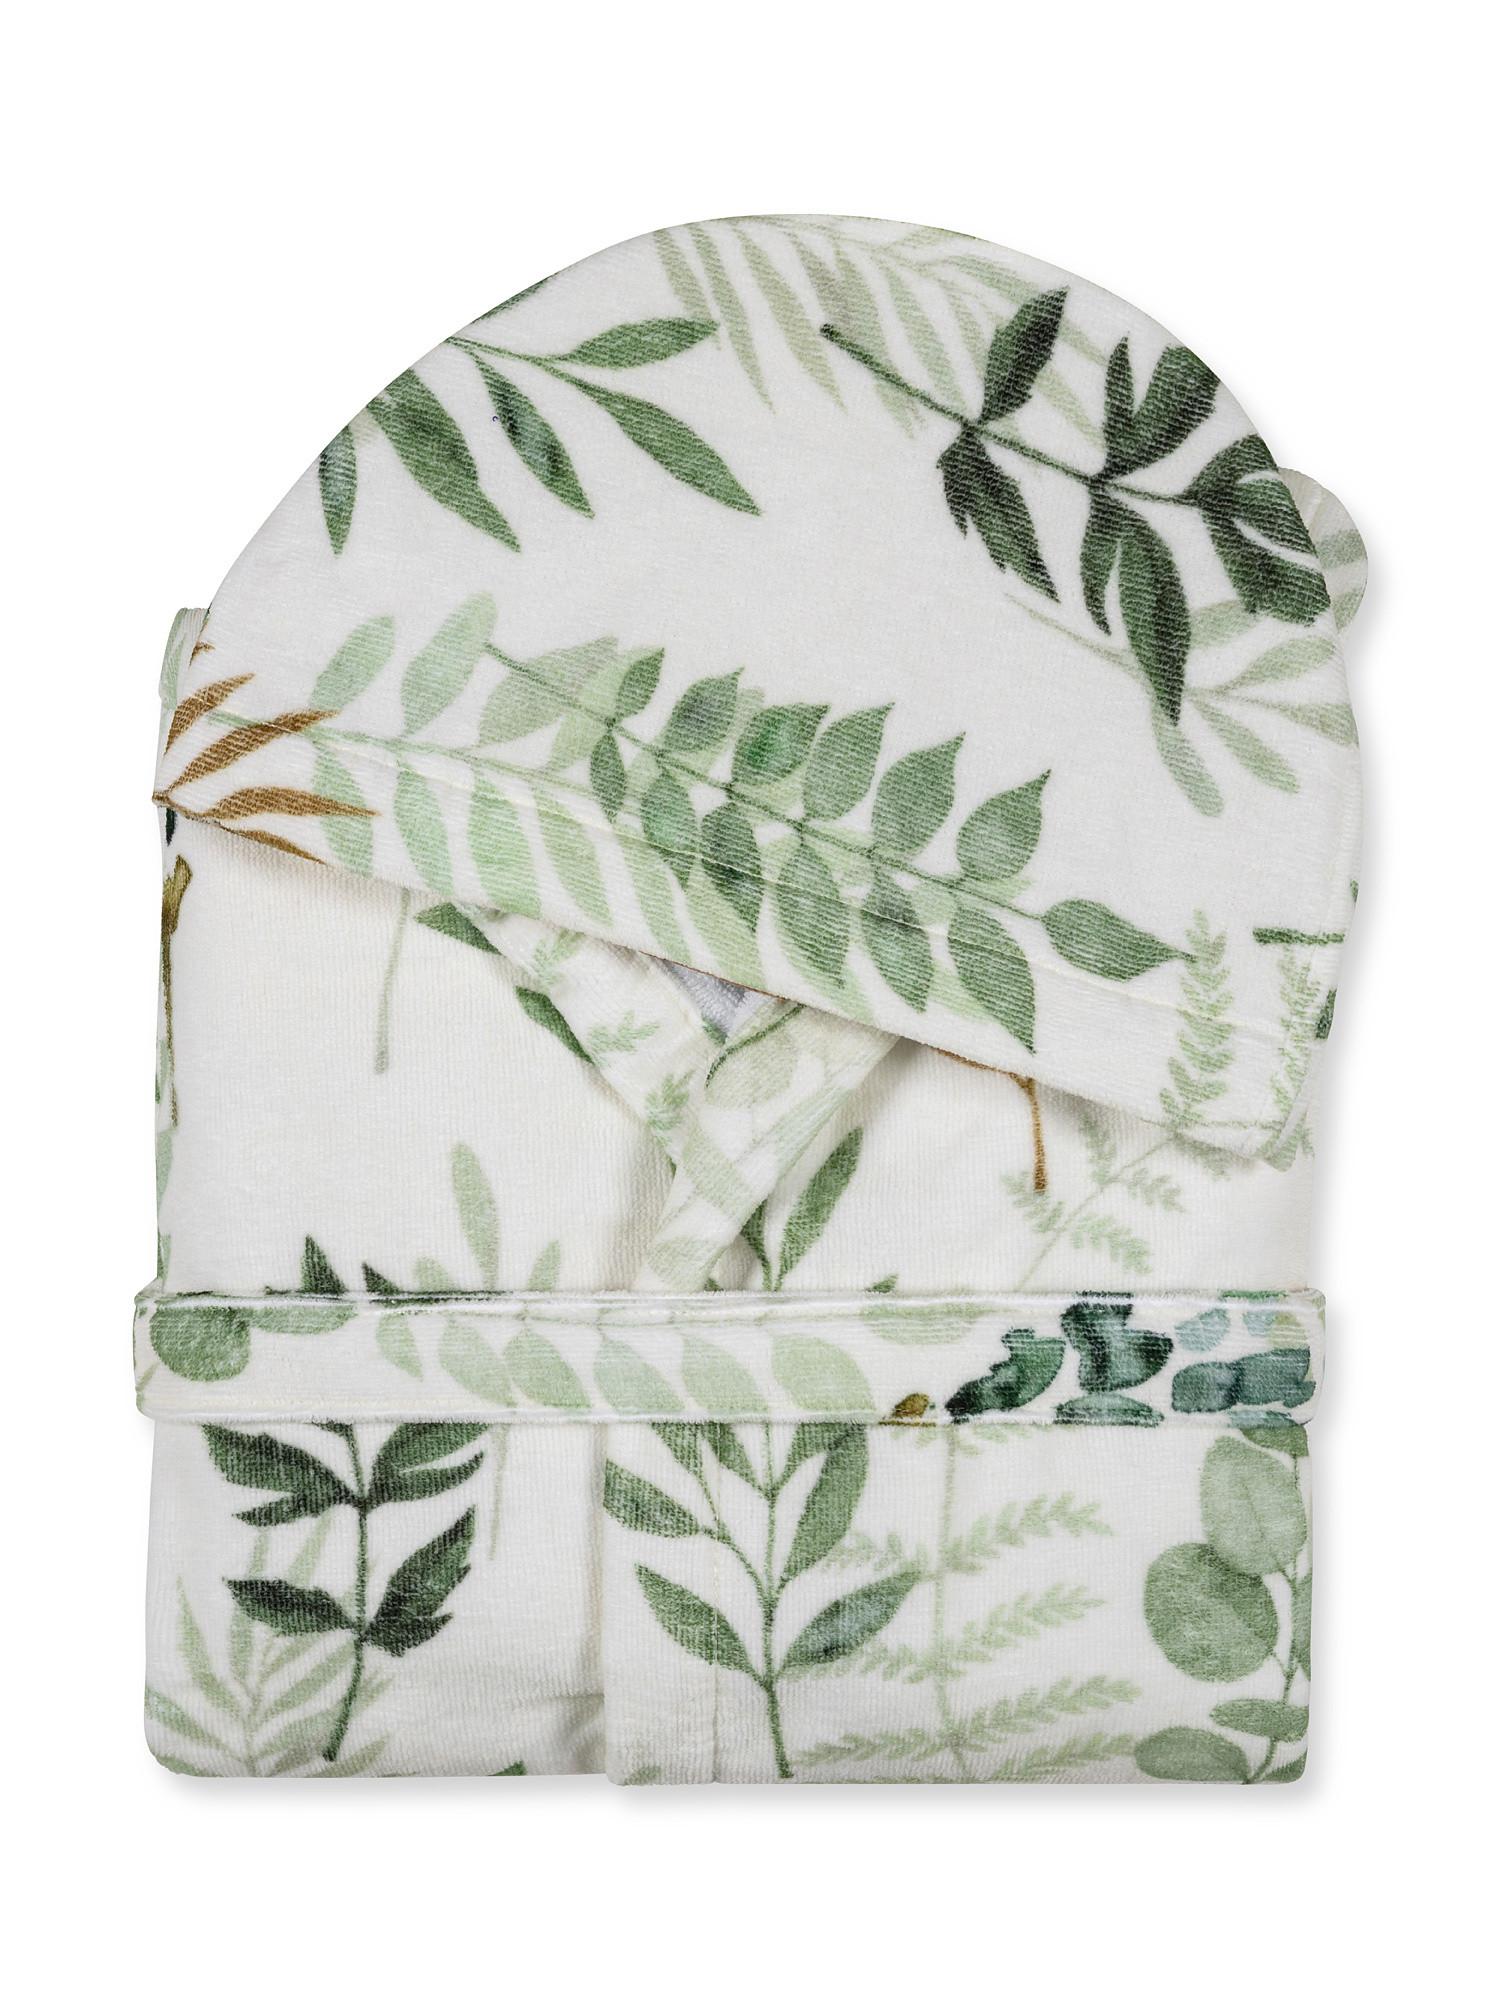 Accappatoio cotone velour motivo botanico, Bianco, large image number 1